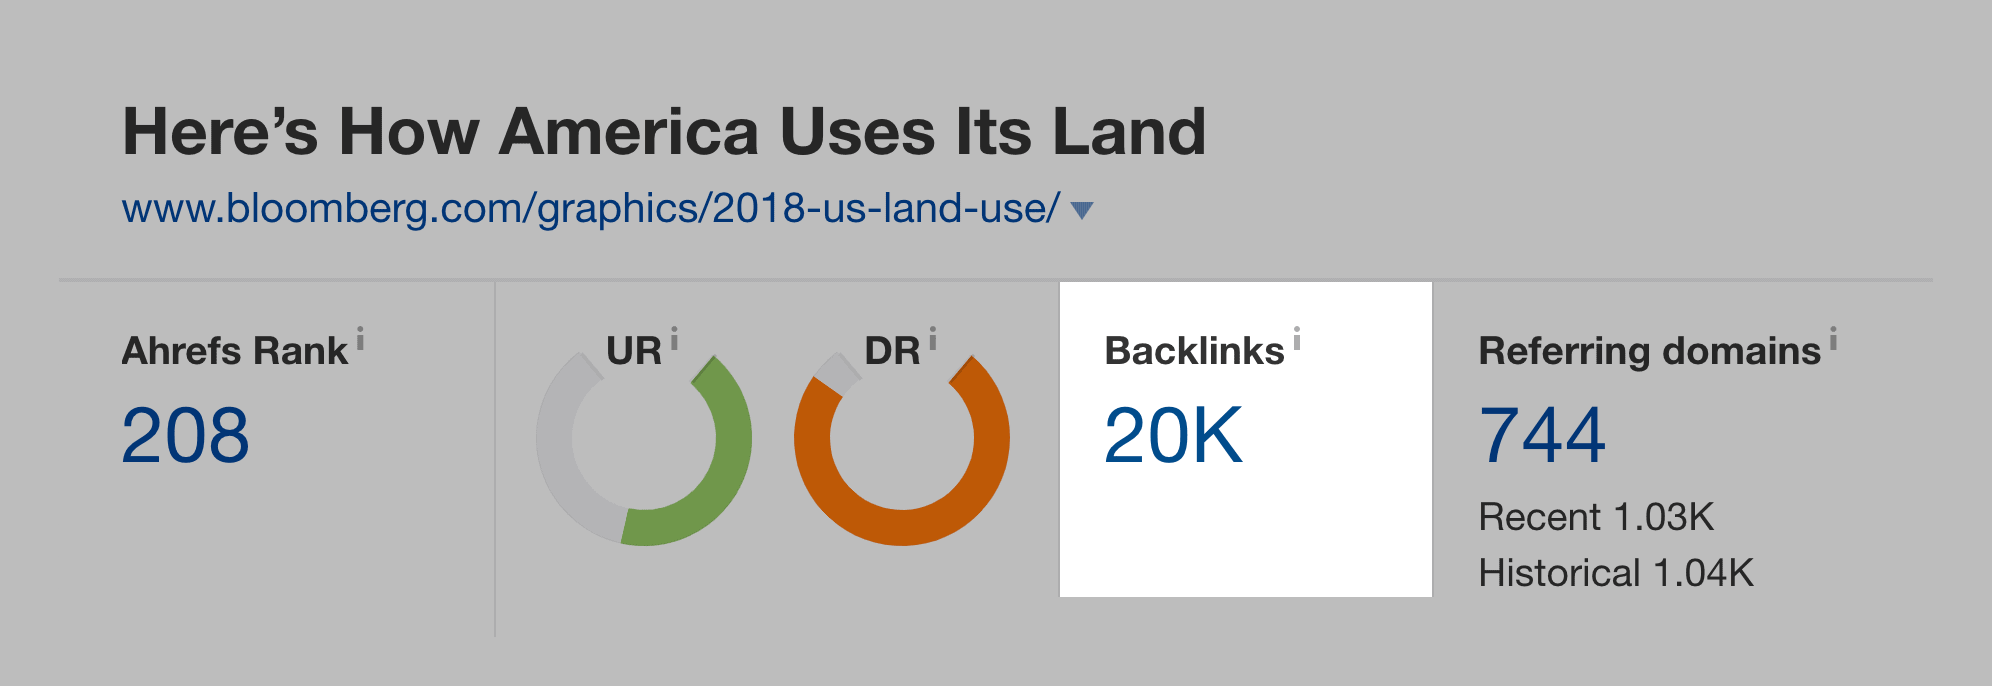 Bloomberg graphic – Backlinks